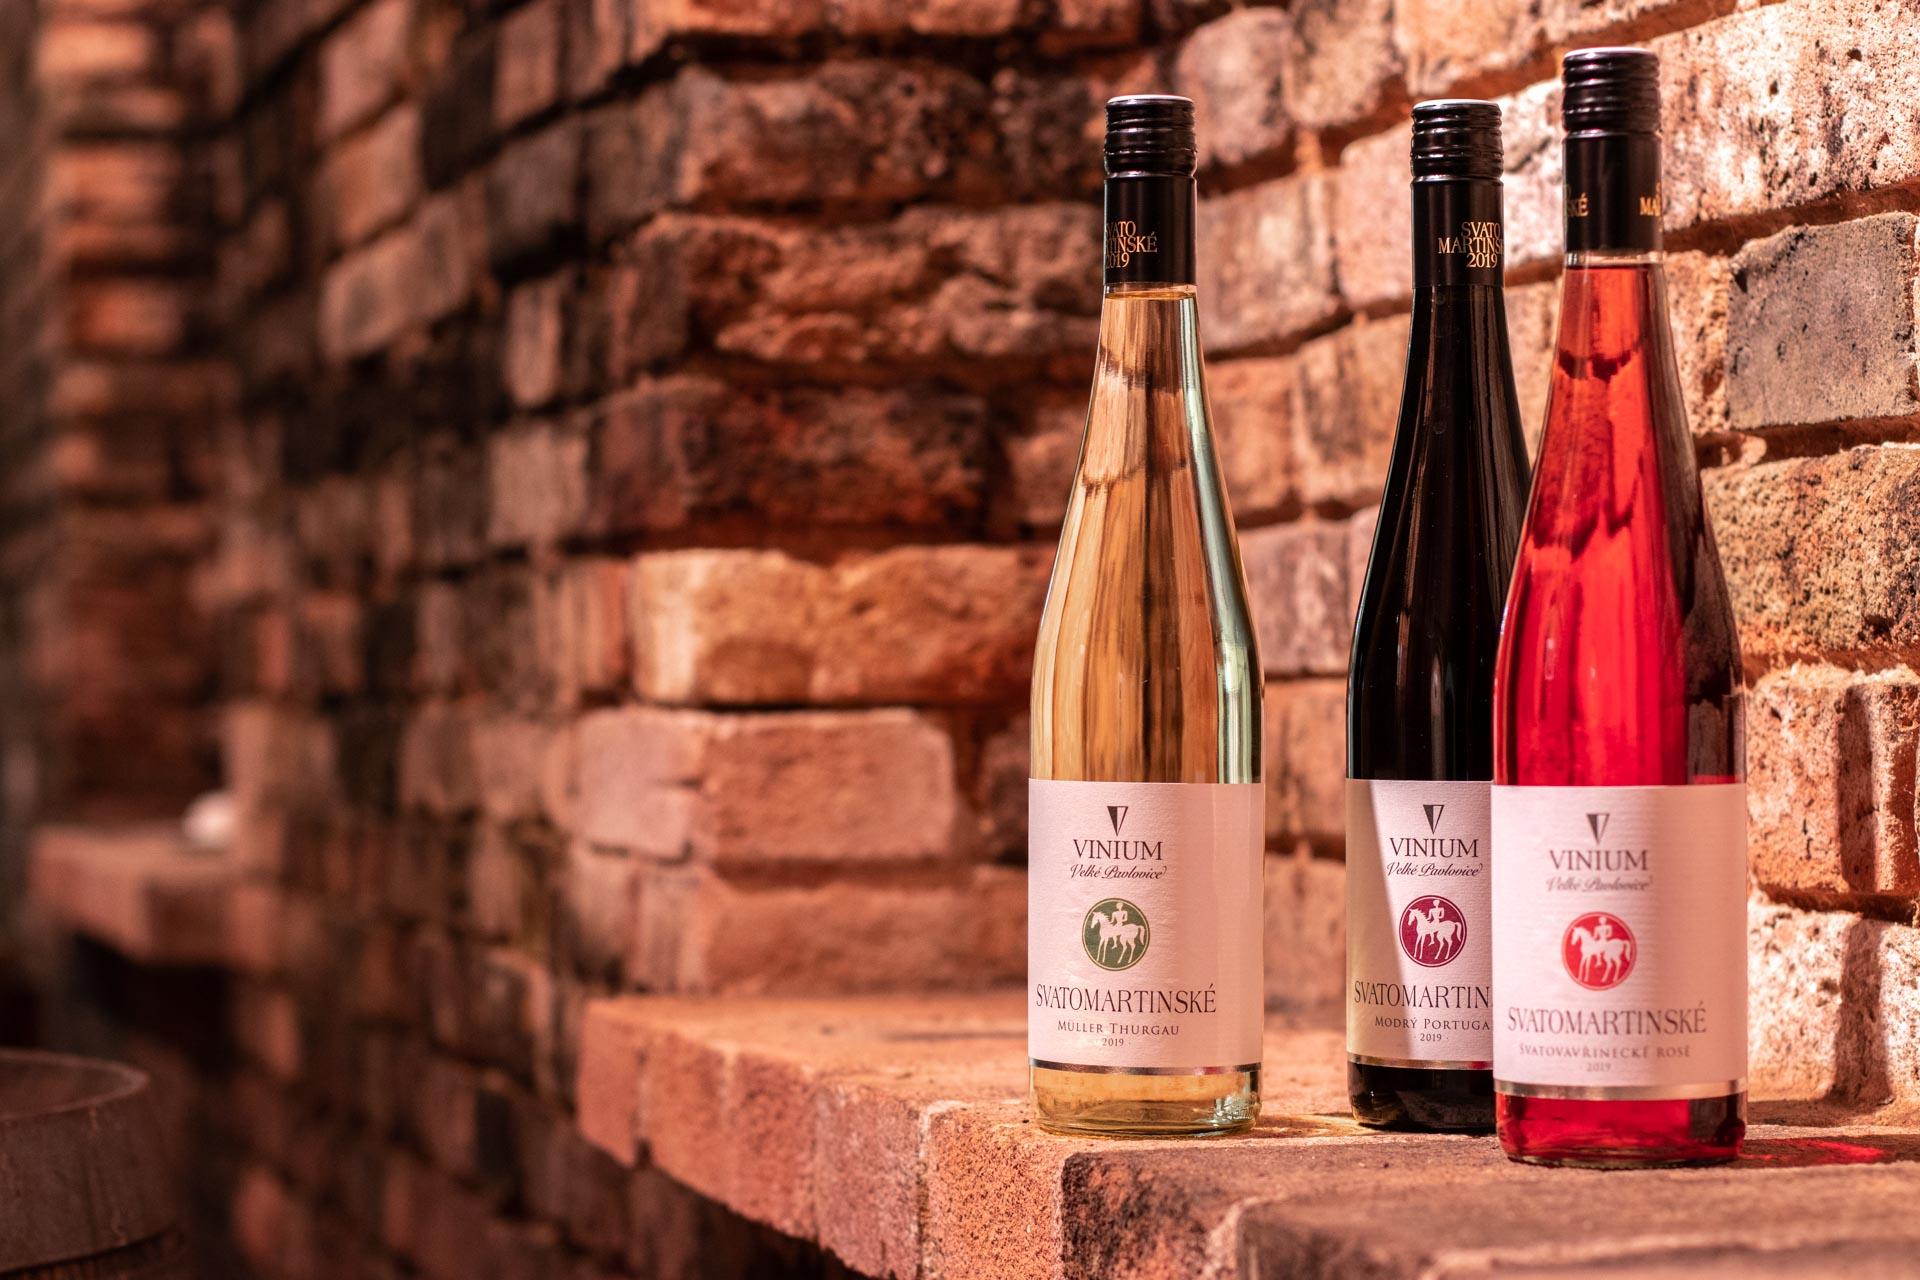 Svatomartinské víno 2019, VINIUM, bílé víno, červené víno, růžové víno